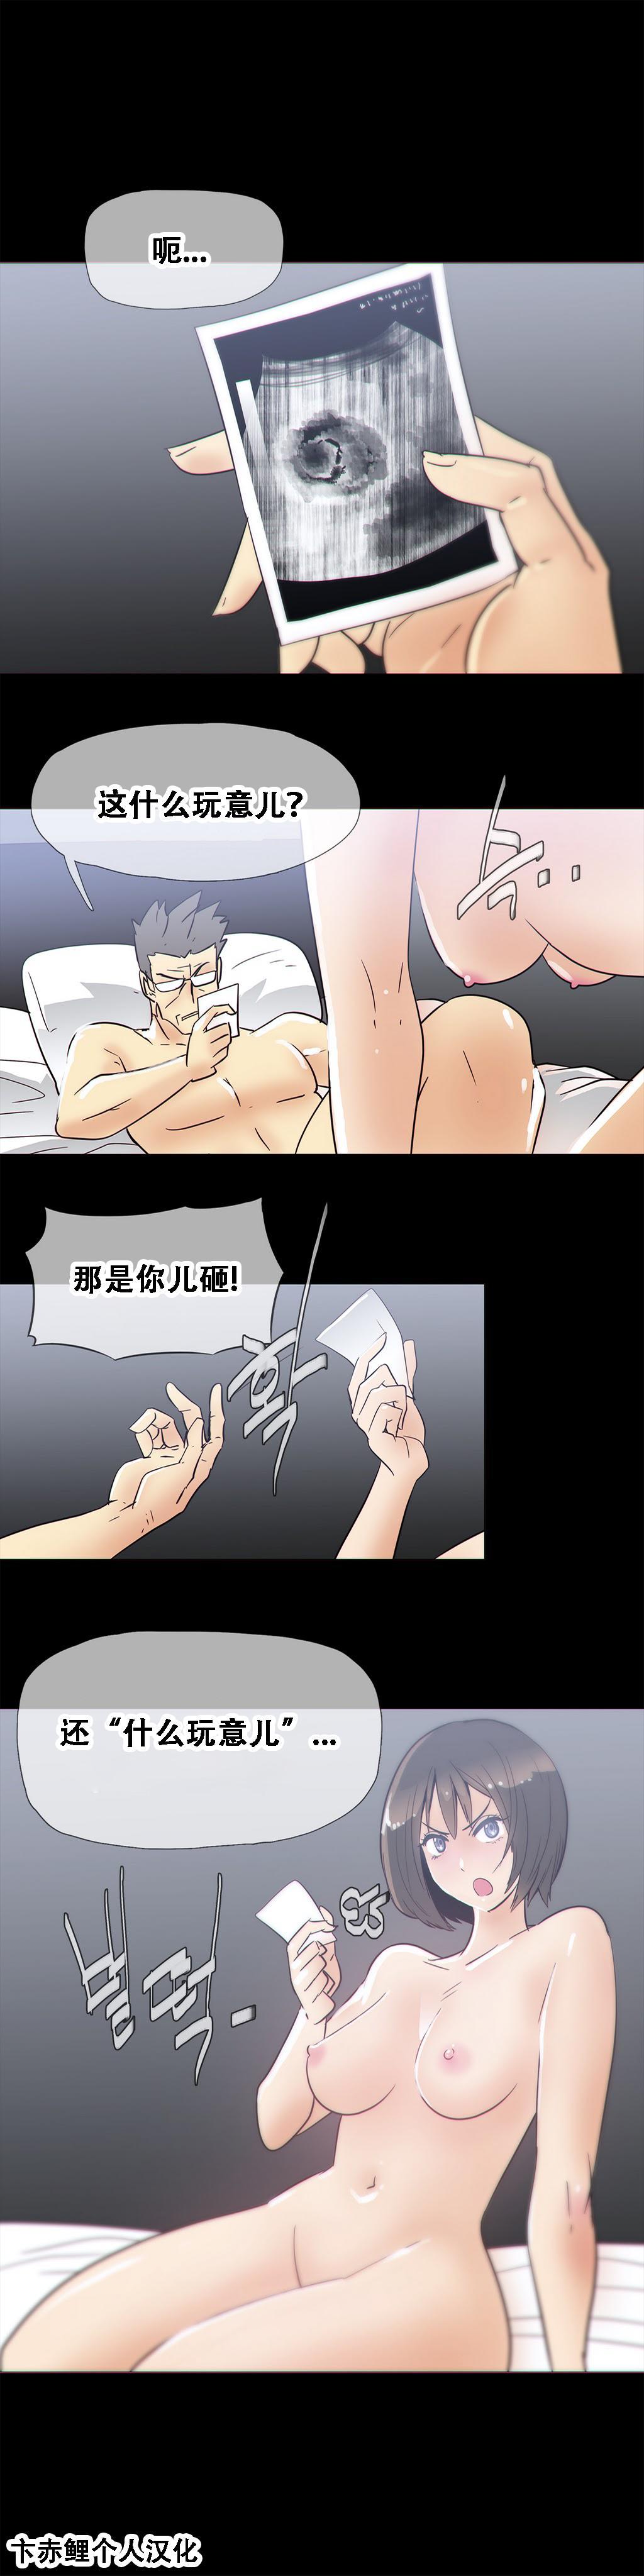 HouseHold Affairs 【卞赤鲤个人汉化】1~21话(持续更新中) 387